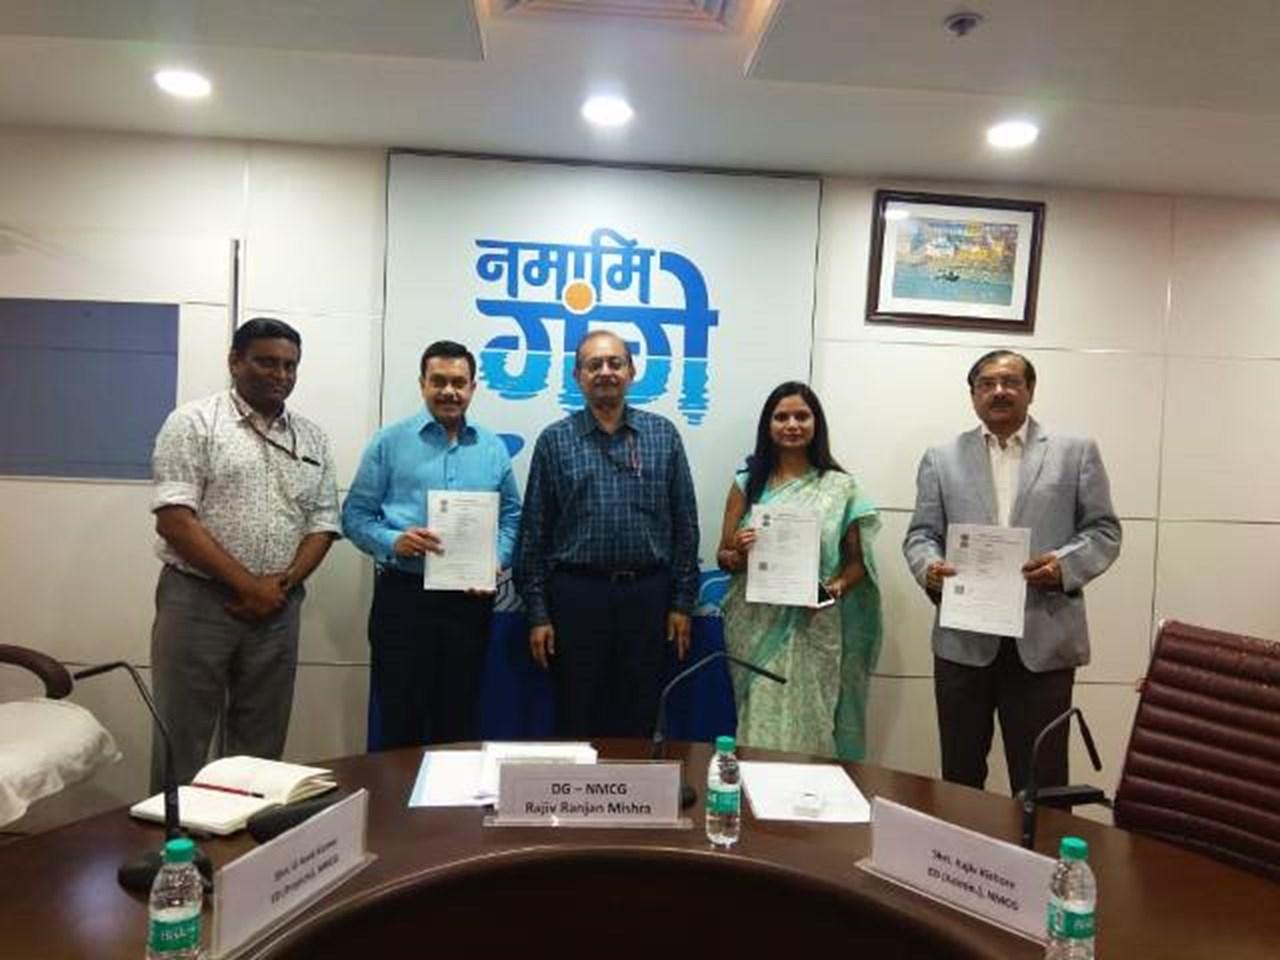 Daily Current Affairs - NMGC approves new projects for rejuvenation of 6 rivers in Uttarakhand   உத்தரகண்ட் மாநிலத்தில் 6 ஆறுகளை புத்துயிர் பெறுவதற்கான புதிய திட்டங்களுக்கு NMGC ஒப்புதல் அளித்துள்ளது  _40.1